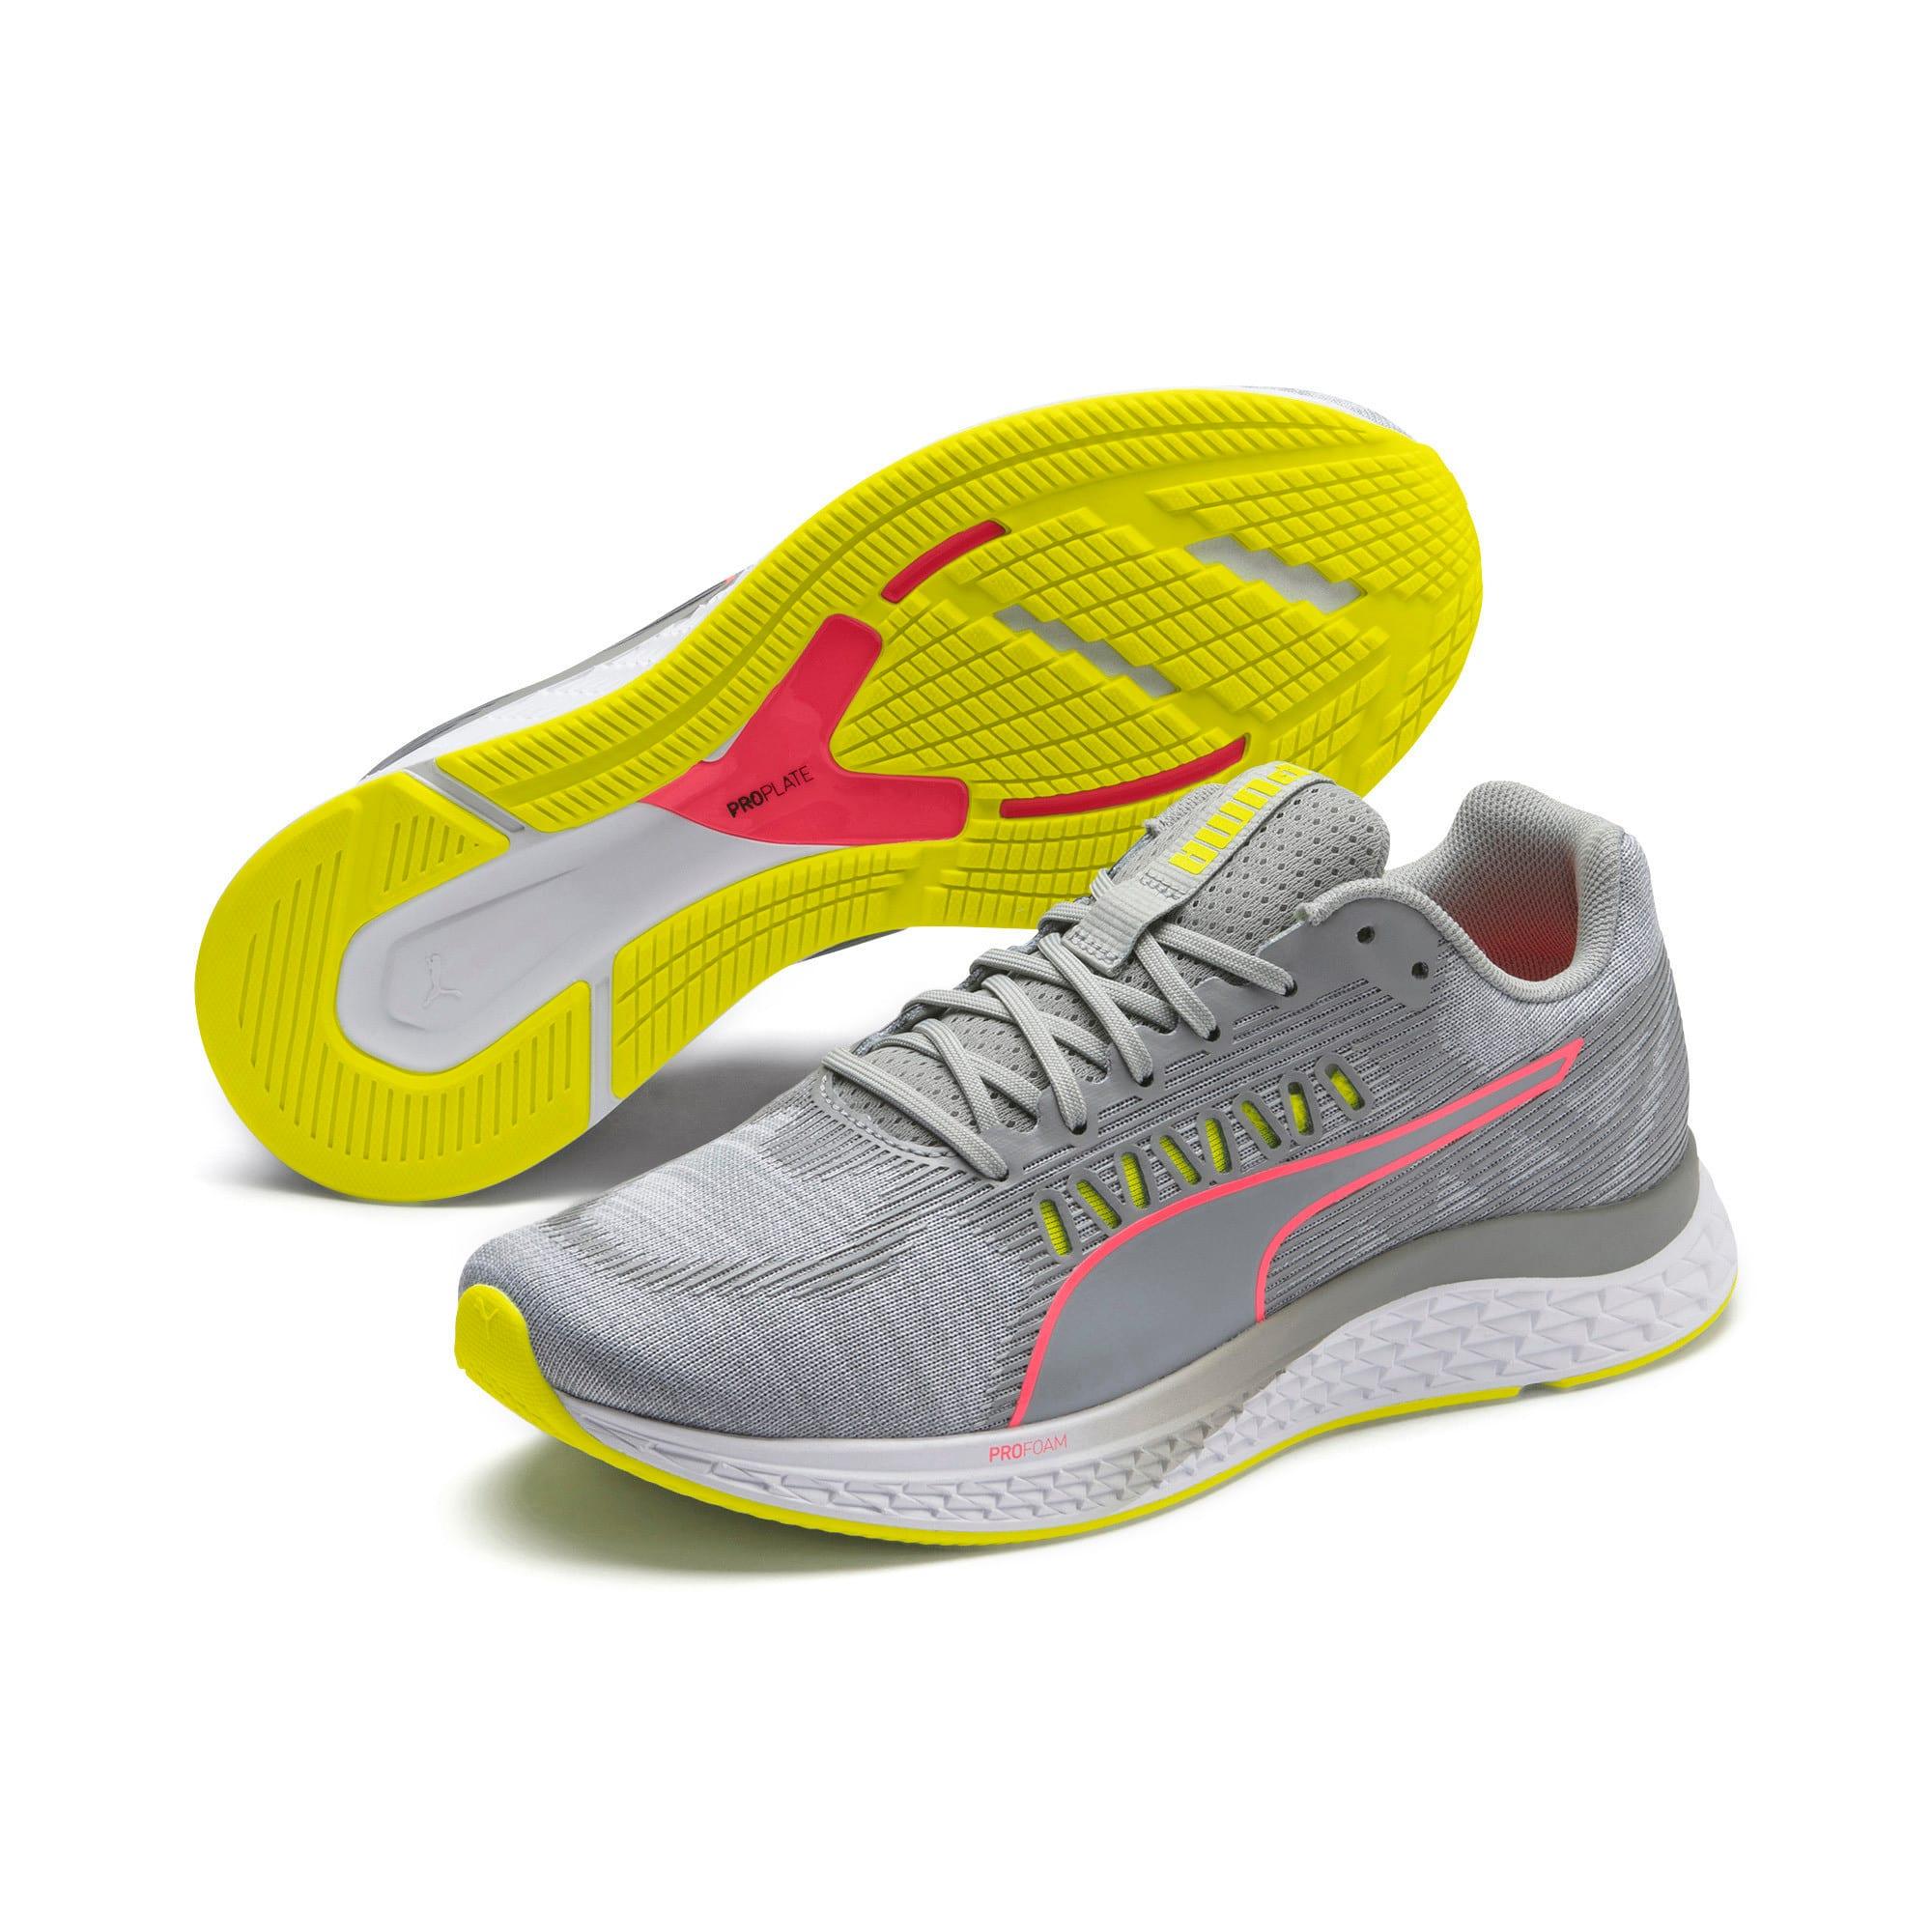 Imagen en miniatura 3 de Zapatillas de running de mujer Speed Sutamina, Quarry-Yellow Alert-Pink, mediana